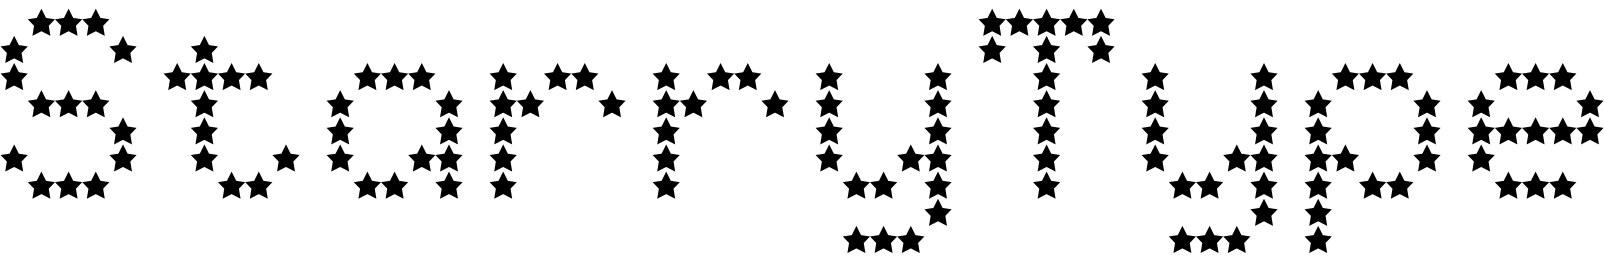 StarryType